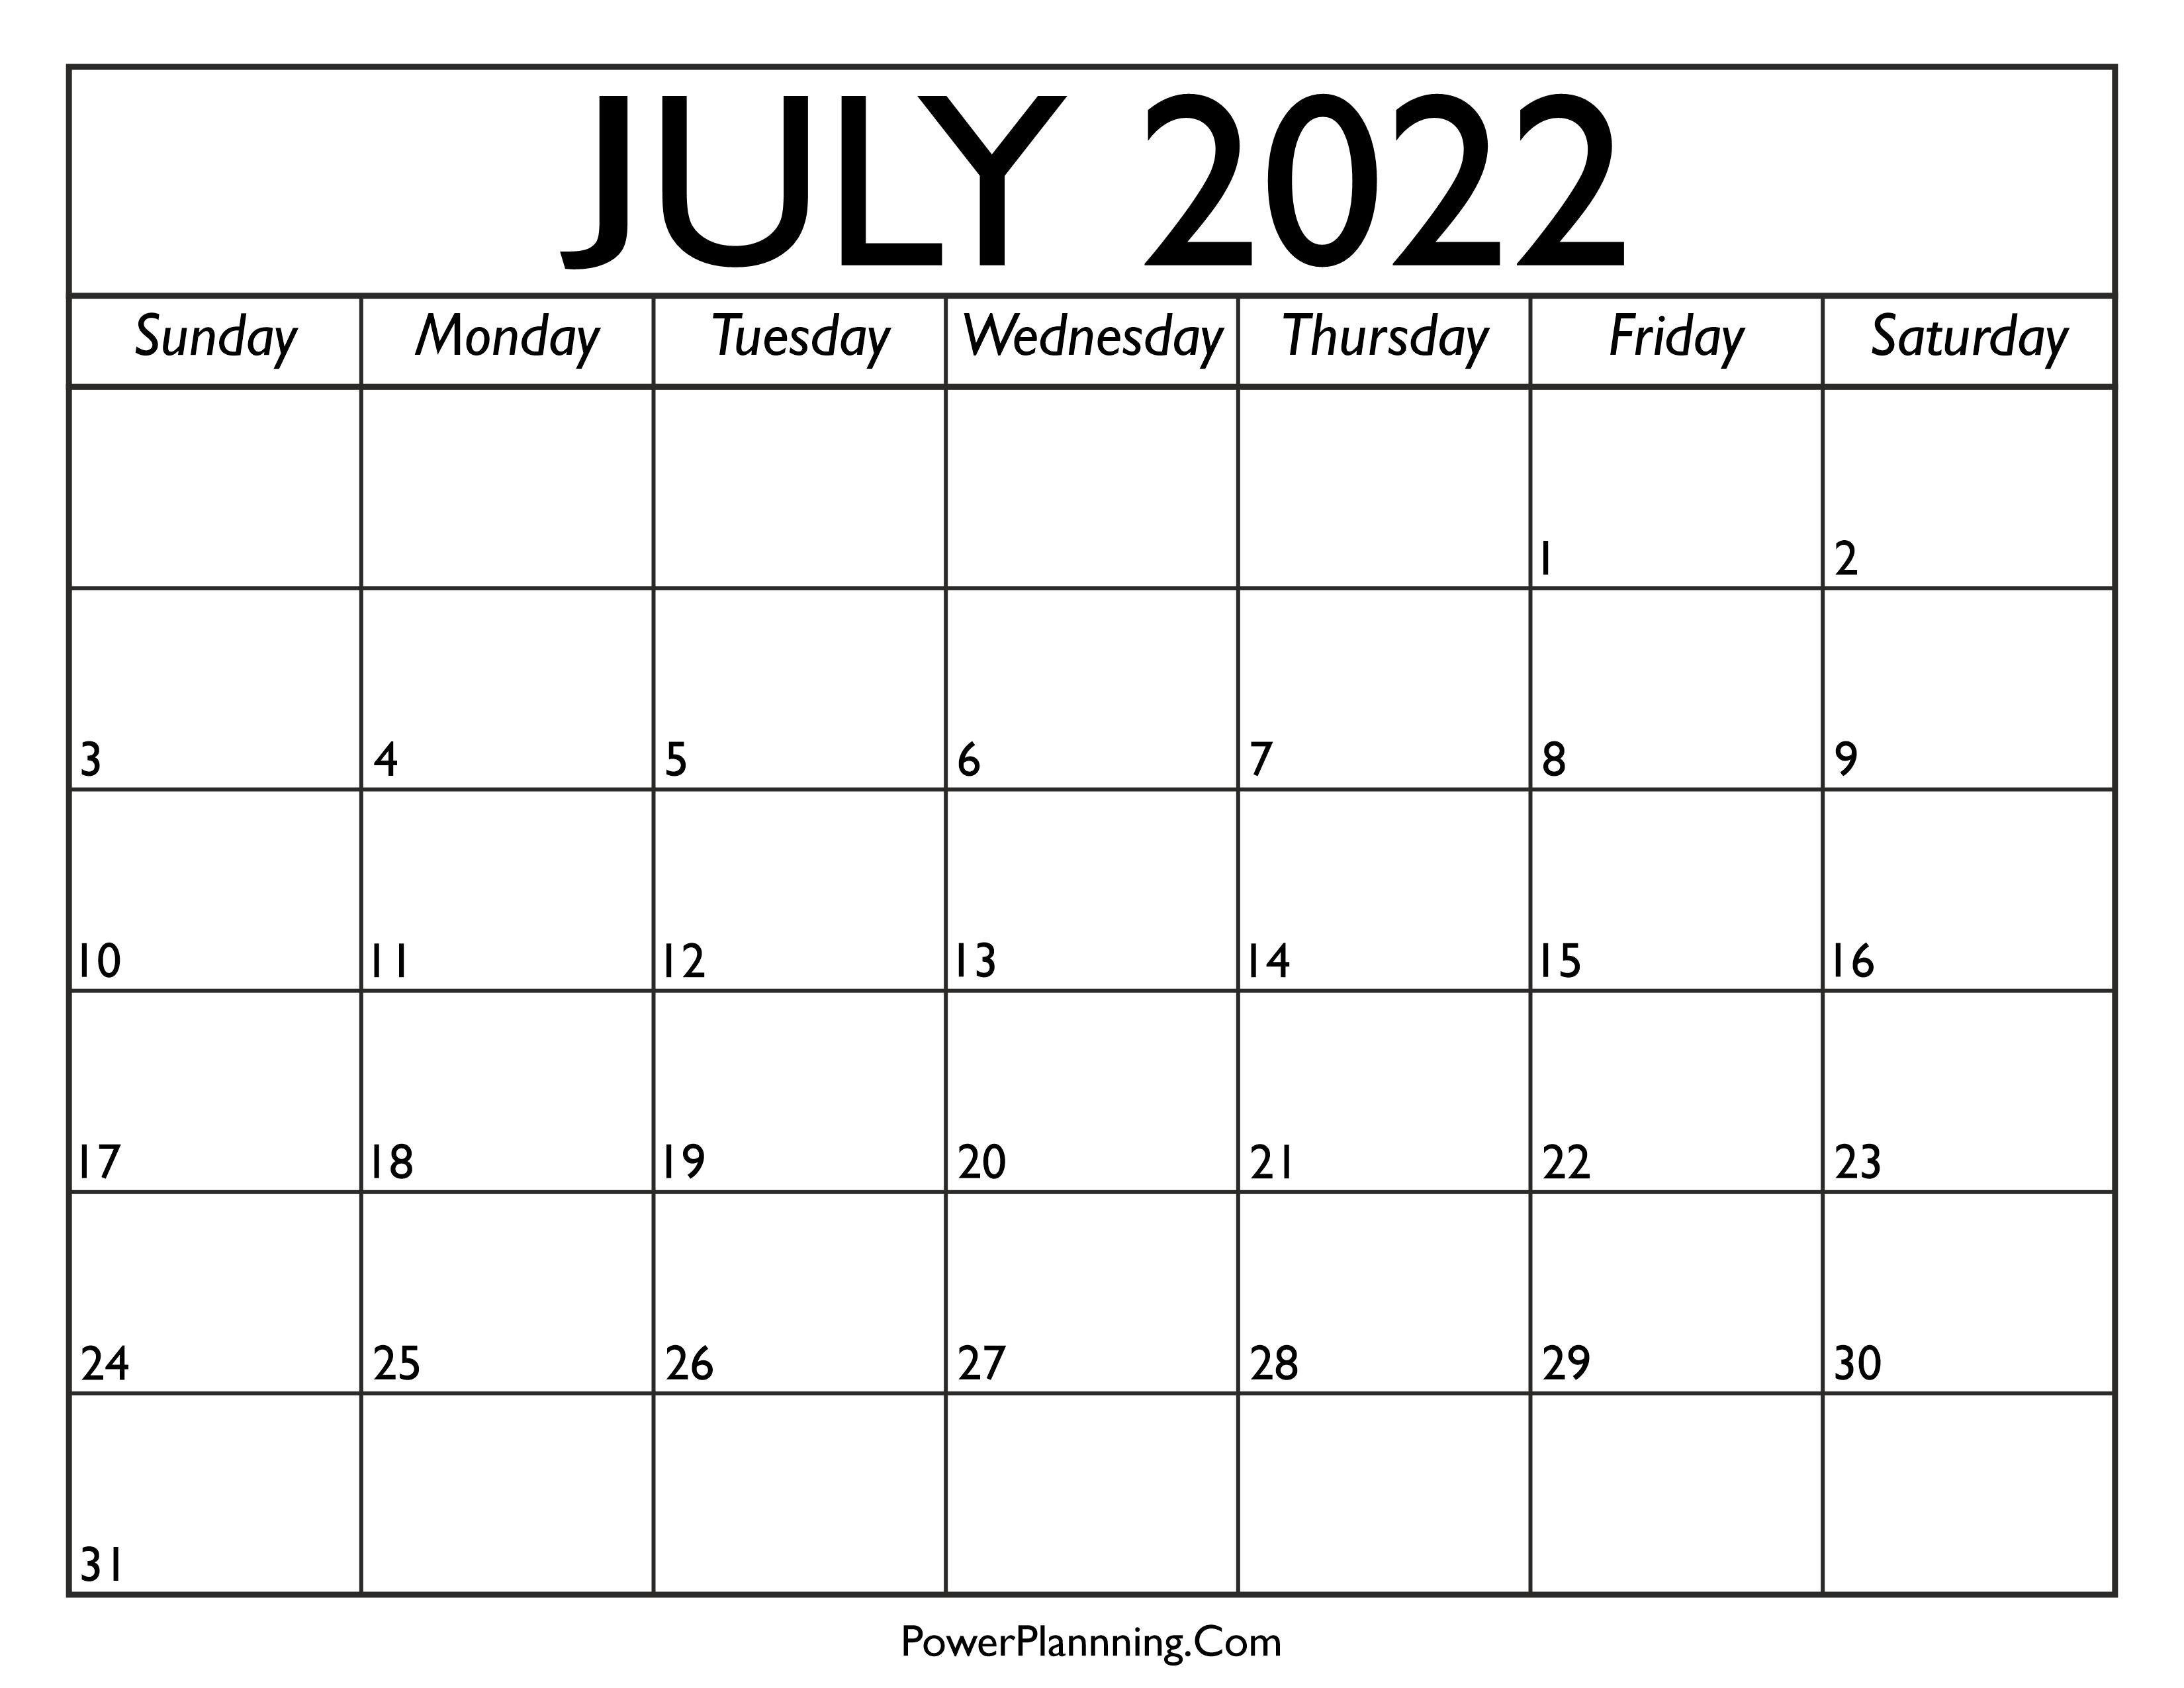 Calendar for July 2022